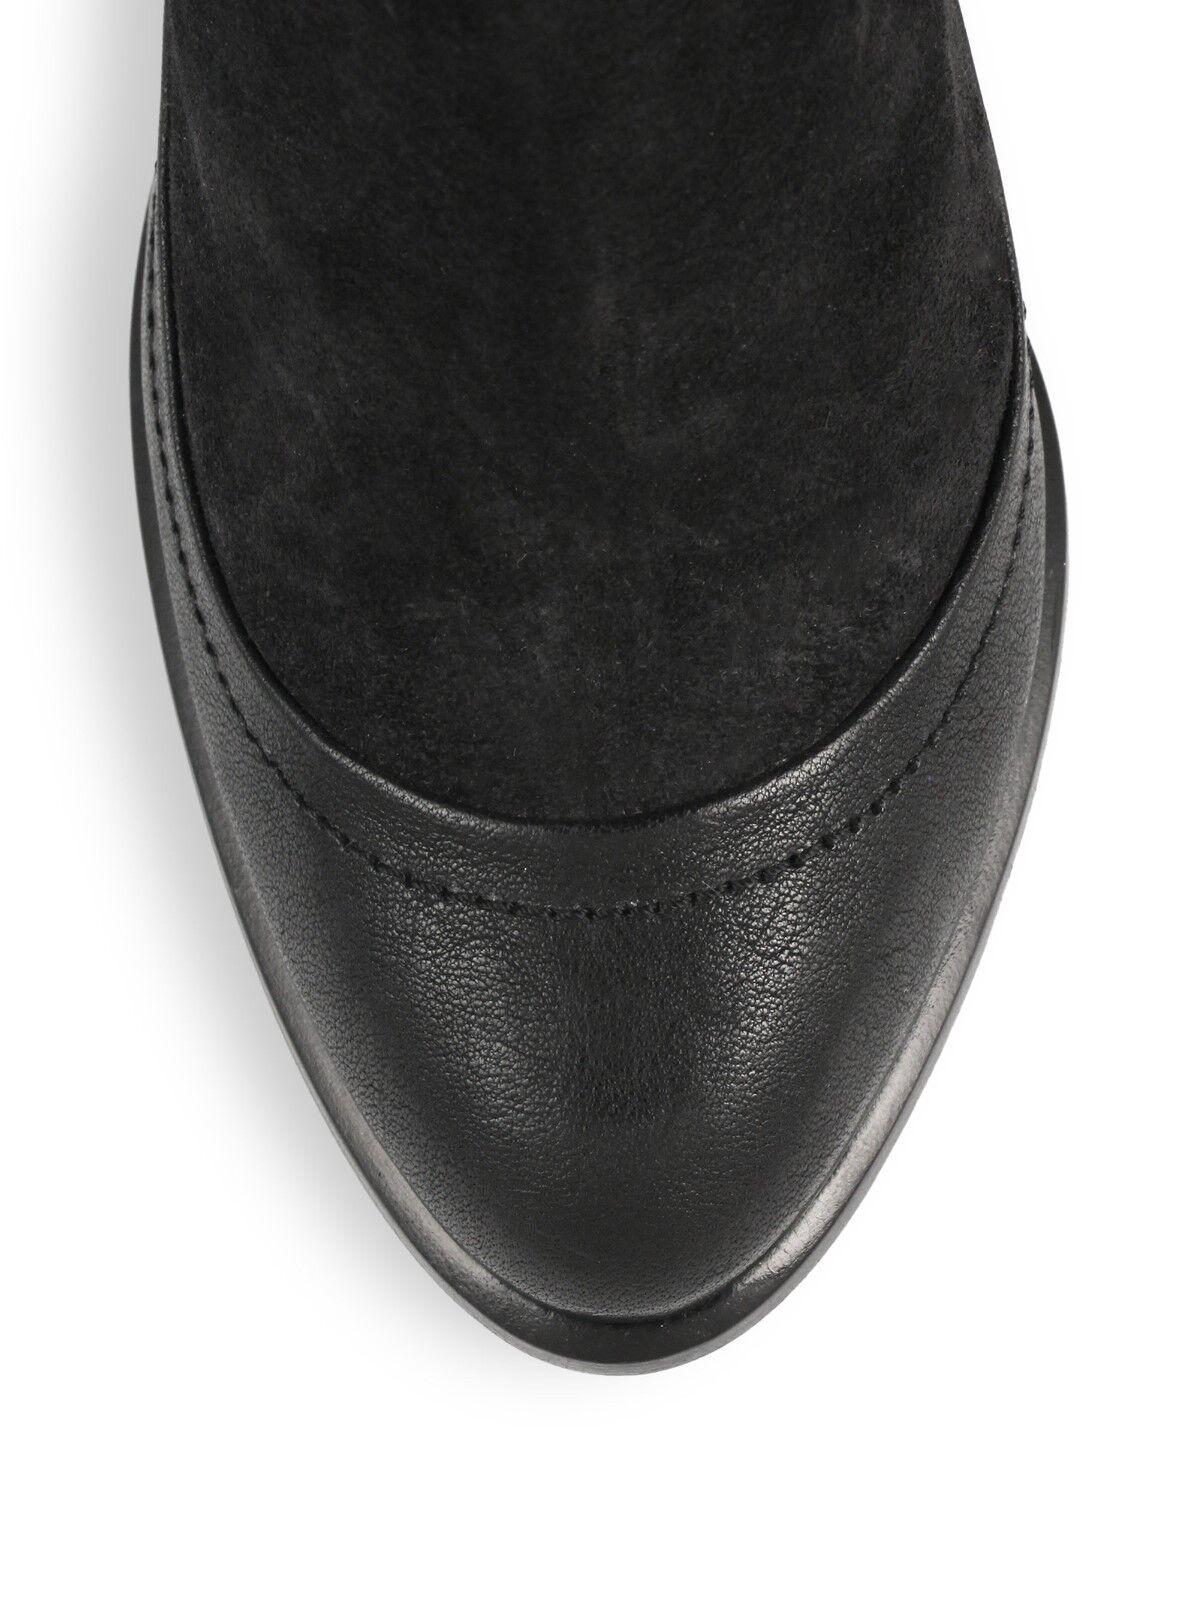 NWOB $595 Rag Albion & Bone Italy Albion Rag  Leder & Suede Bootie Size 36.5(IT) 6.5(US) 6cbd82